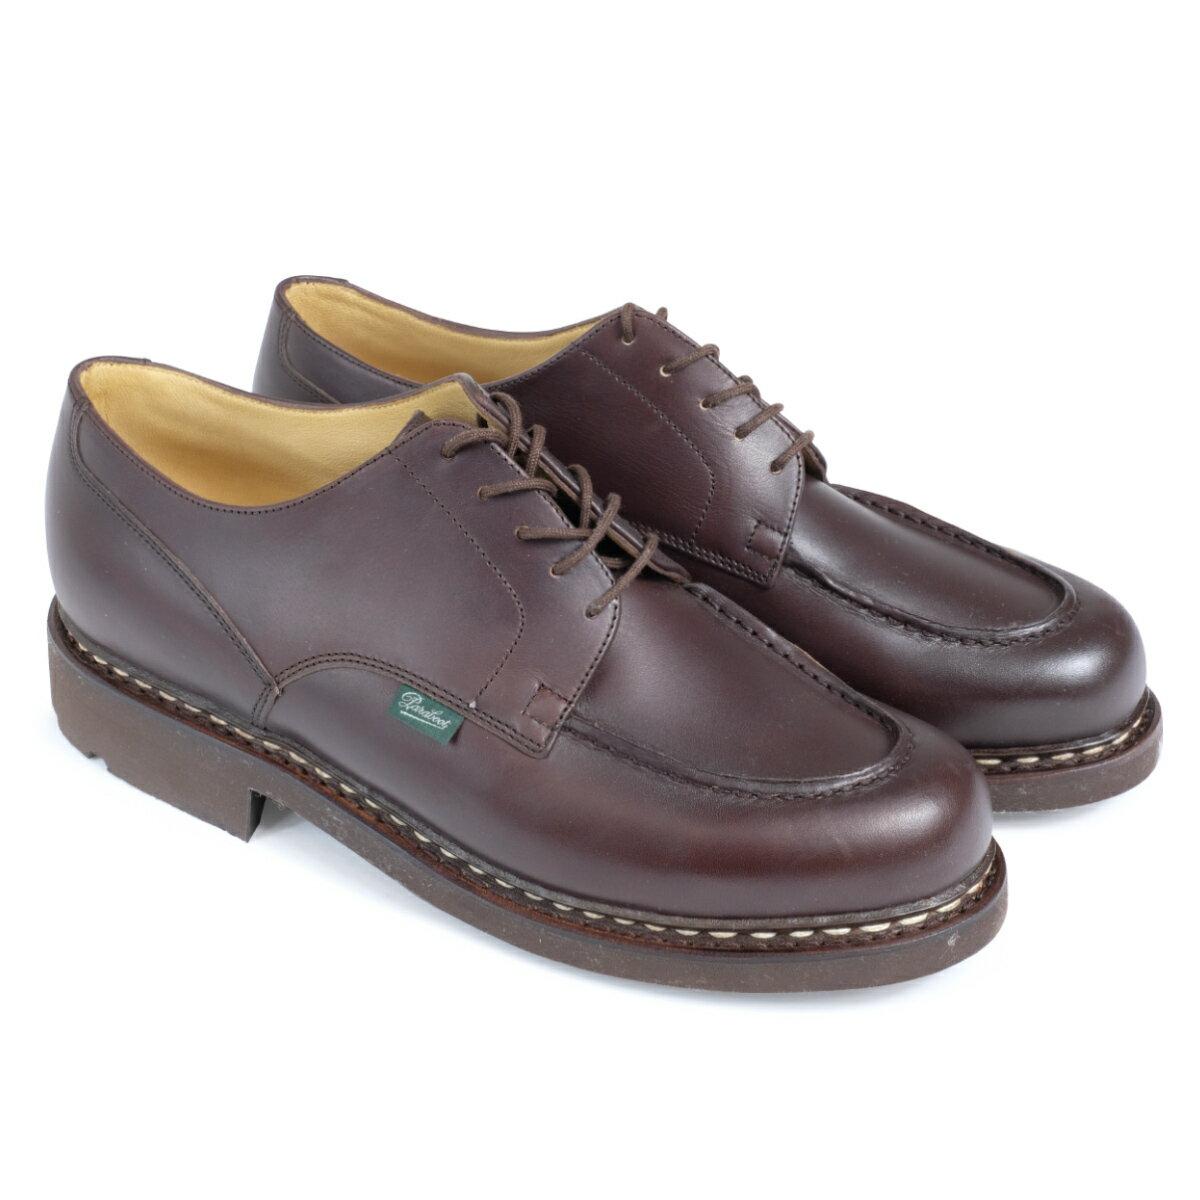 PARABOOT CHAMBORD パラブーツ シャンボード シューズ チロリアンシューズ 710707 メンズ 靴 ブラウン [1711]